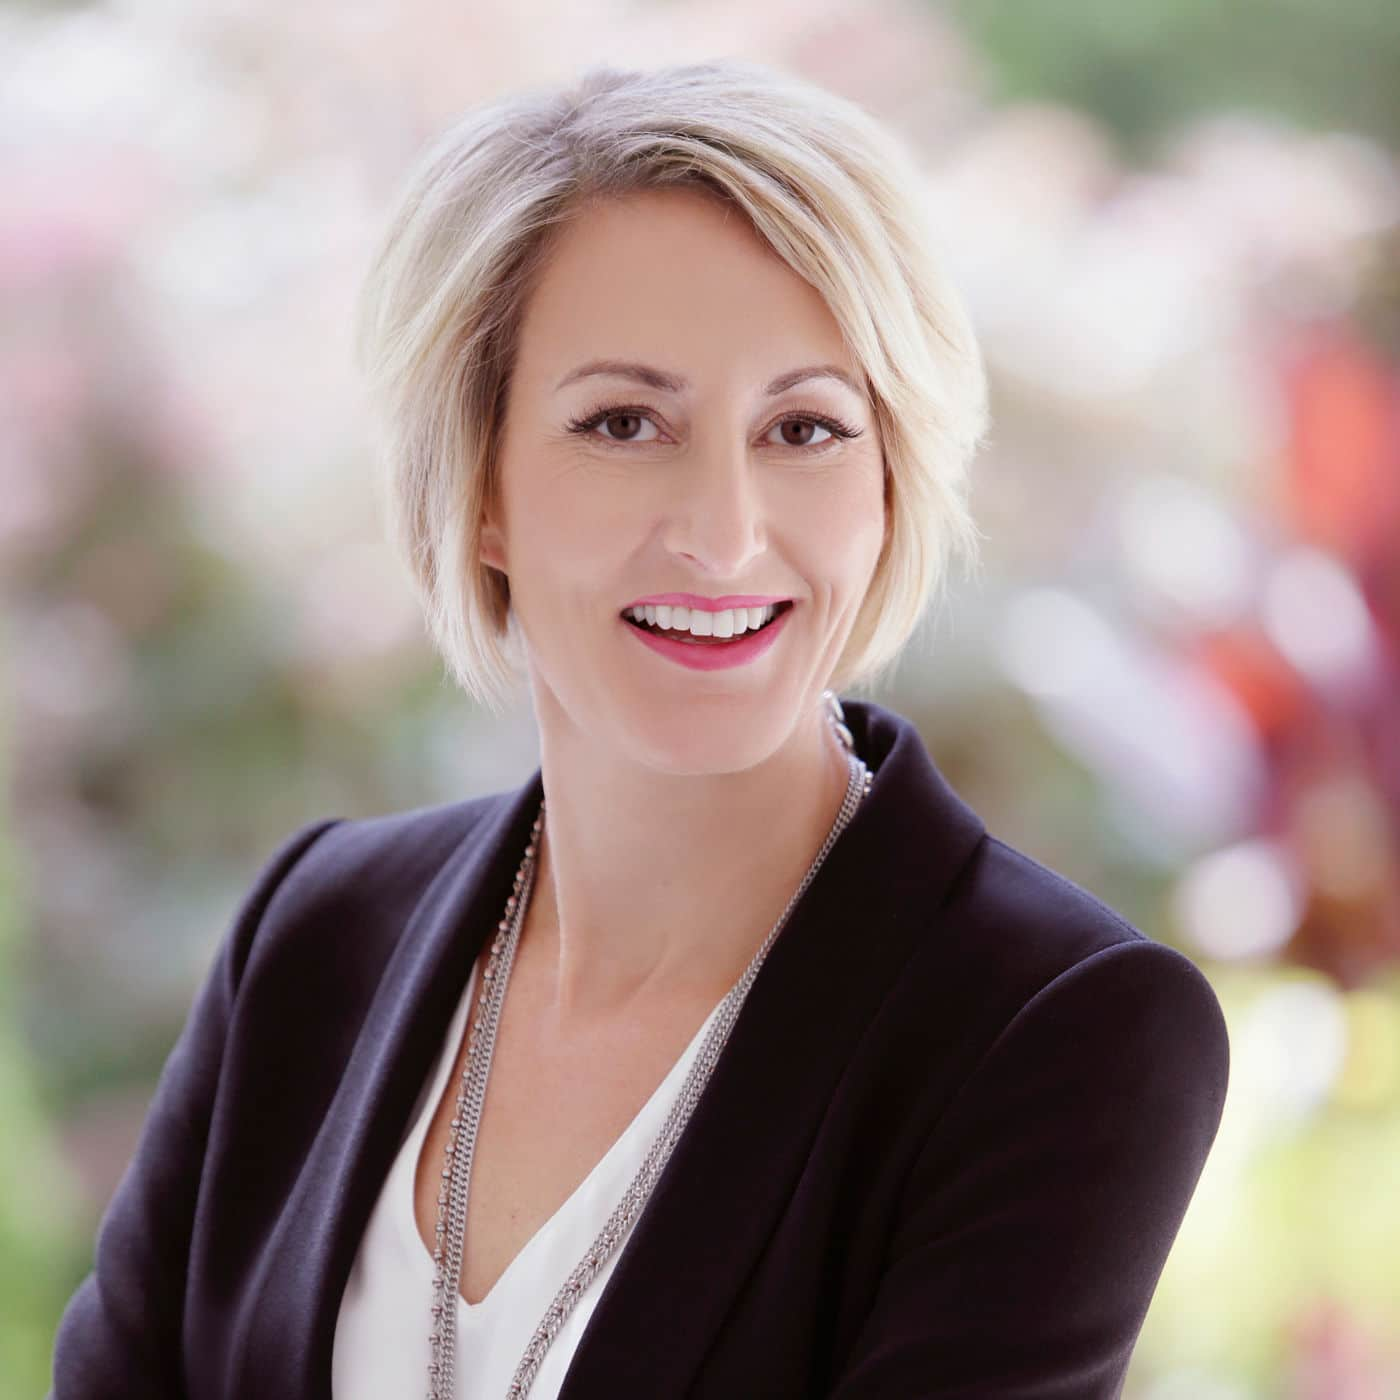 Colleen Francis, professional sales speaker